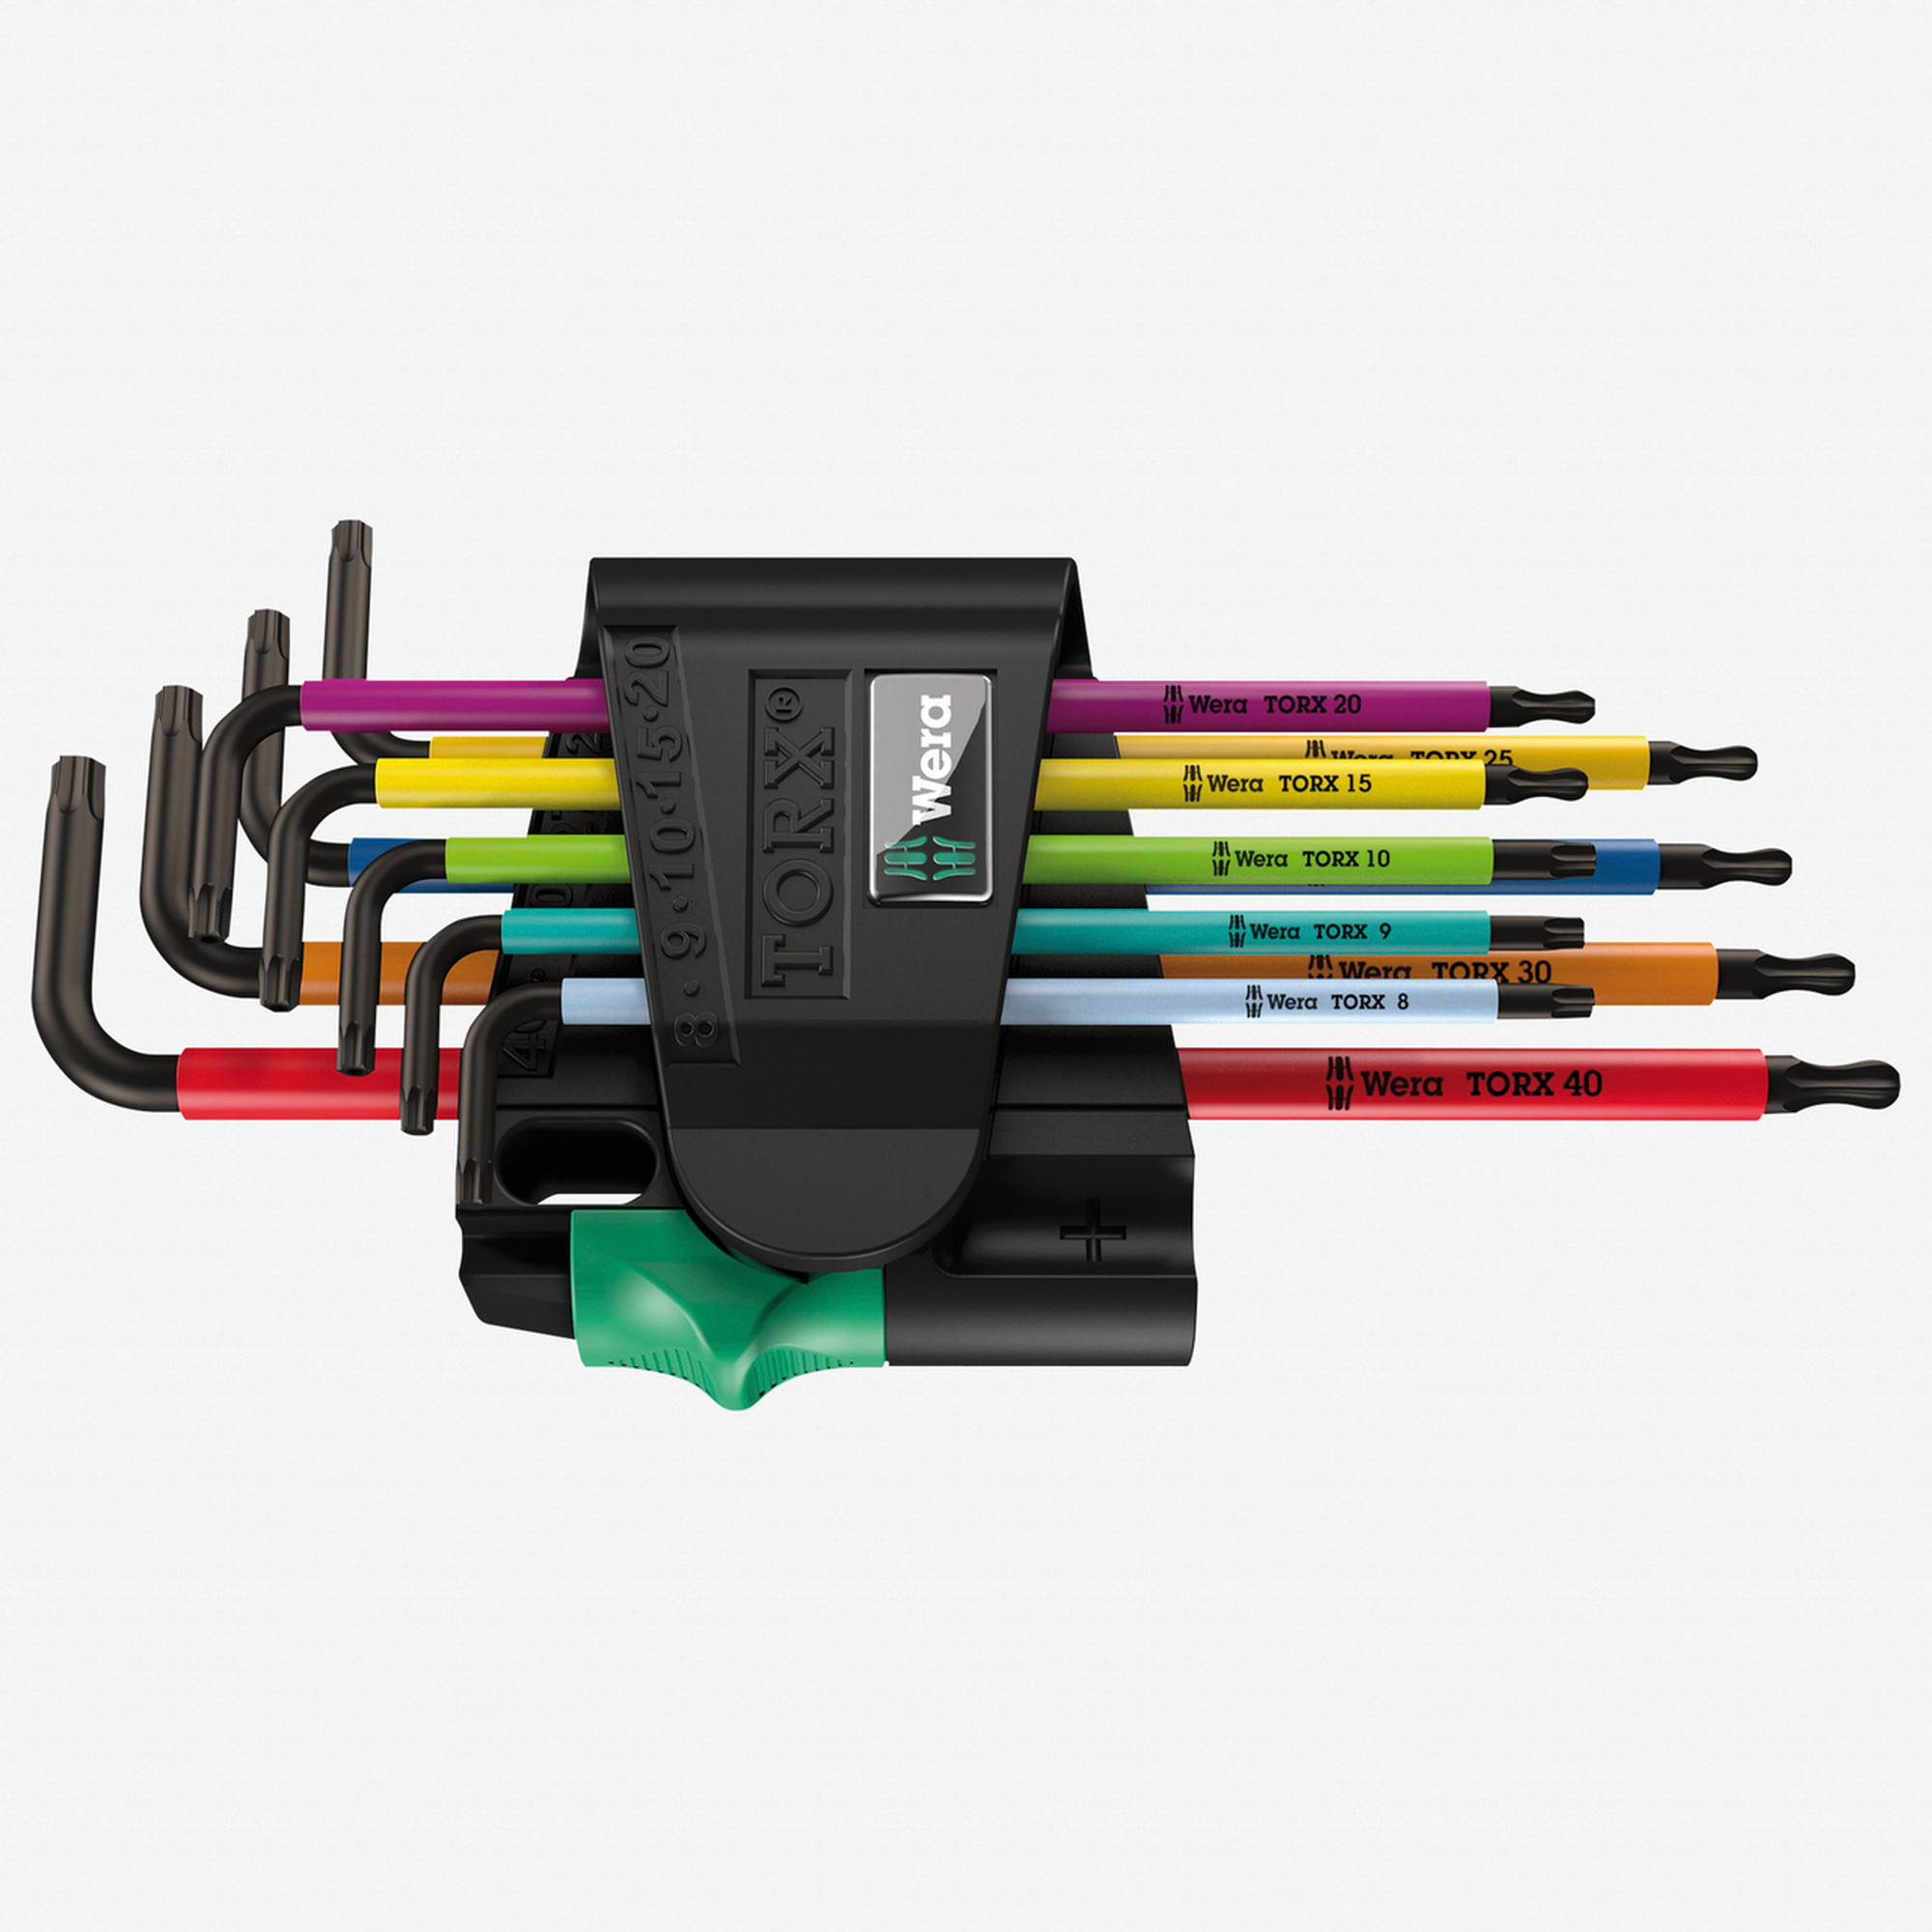 Wera 073599 Multicolor Ball End Torx + Security Torx L-key Clip Set (Retail Box) - KC Tool